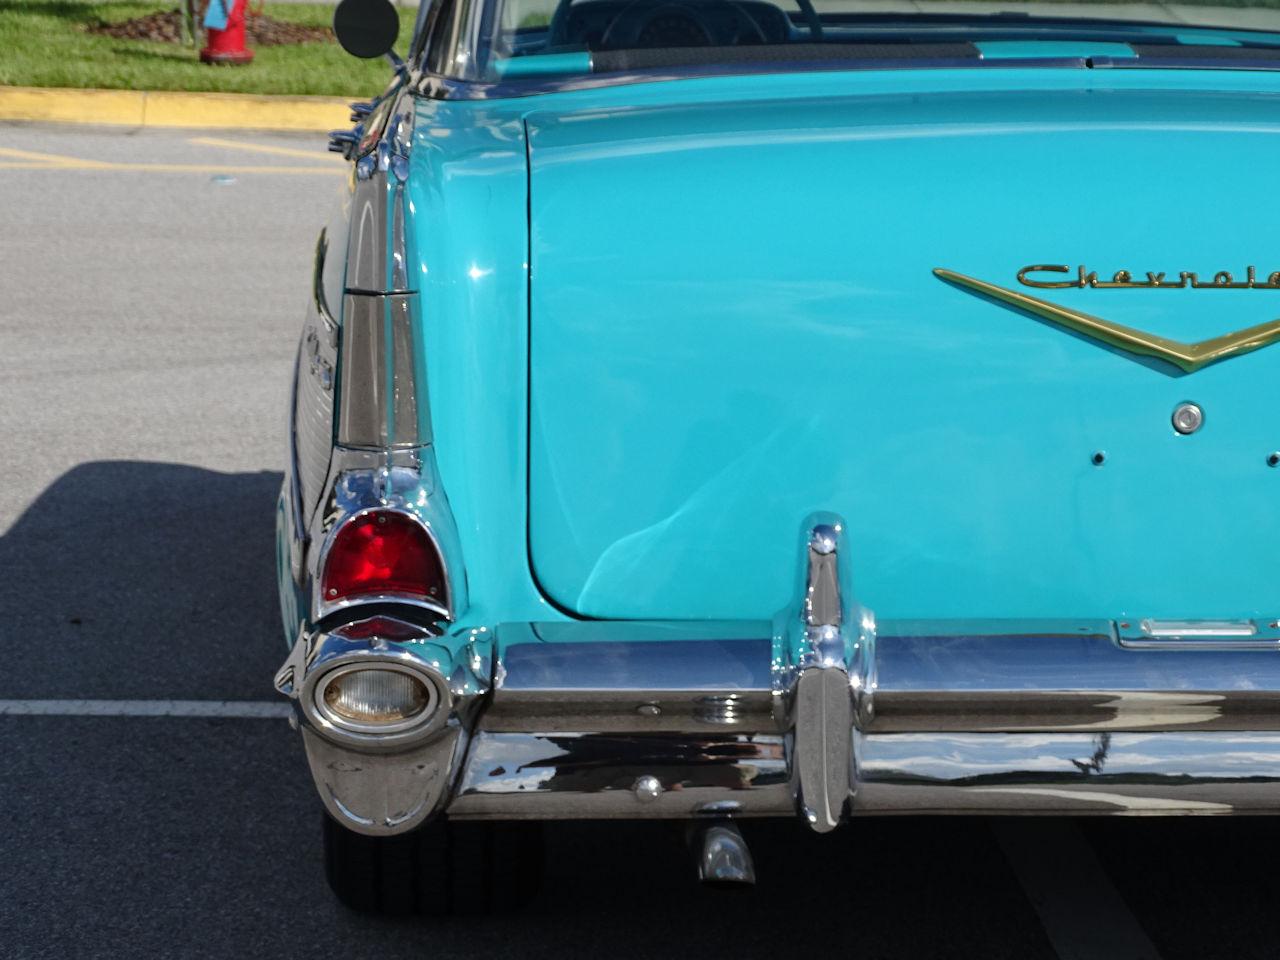 1957 Chevrolet Bel Air 75